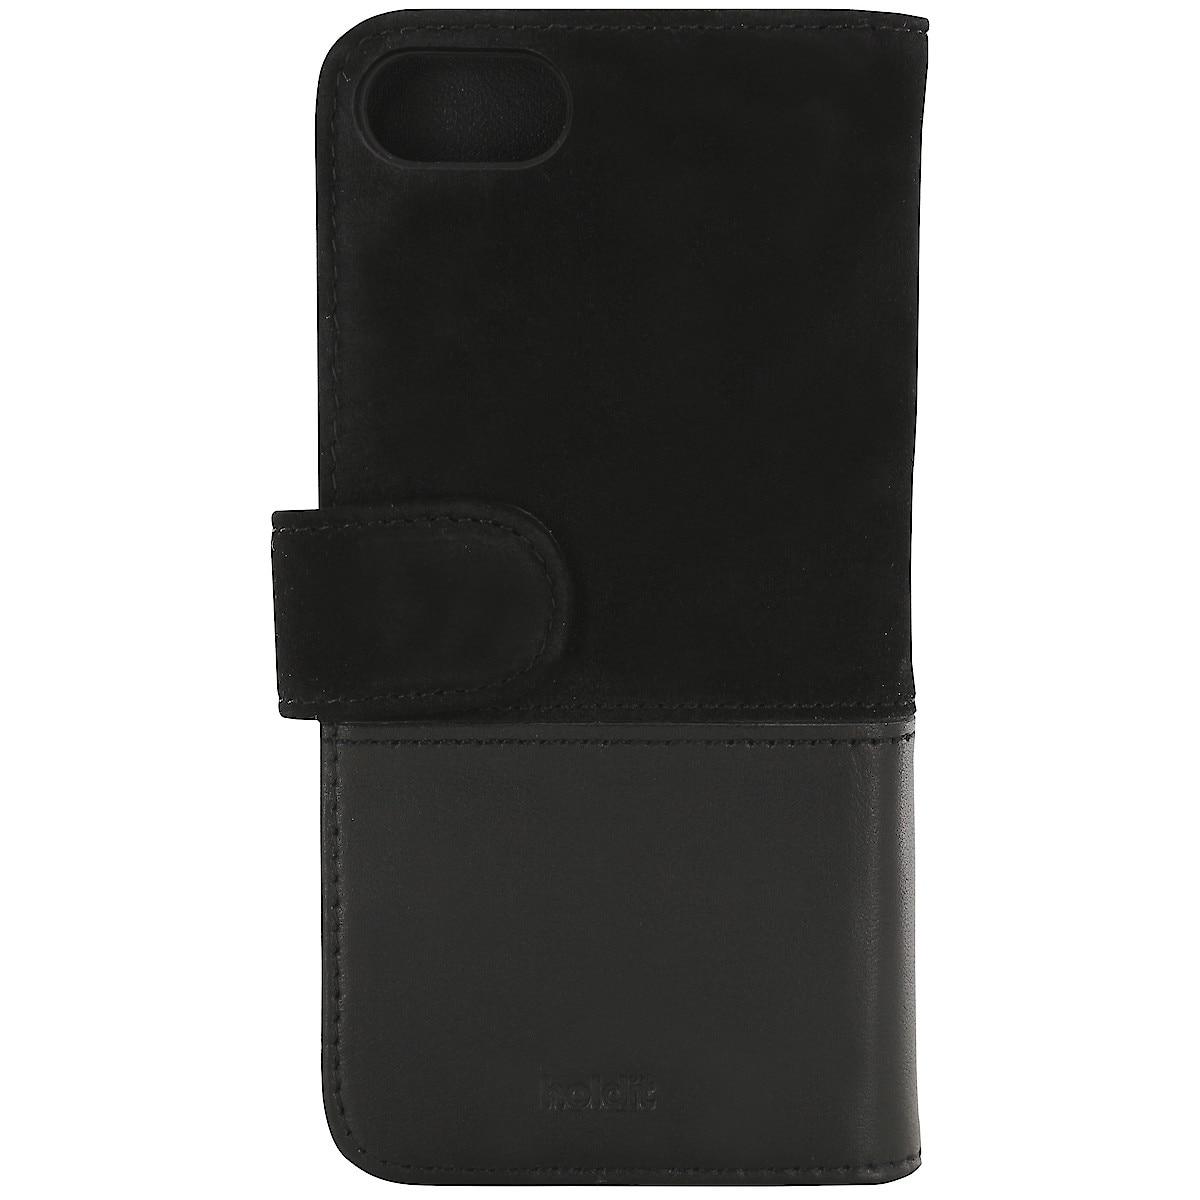 Plånboksfodral för iPhone 6/6s/7/8, Holdit Skrea